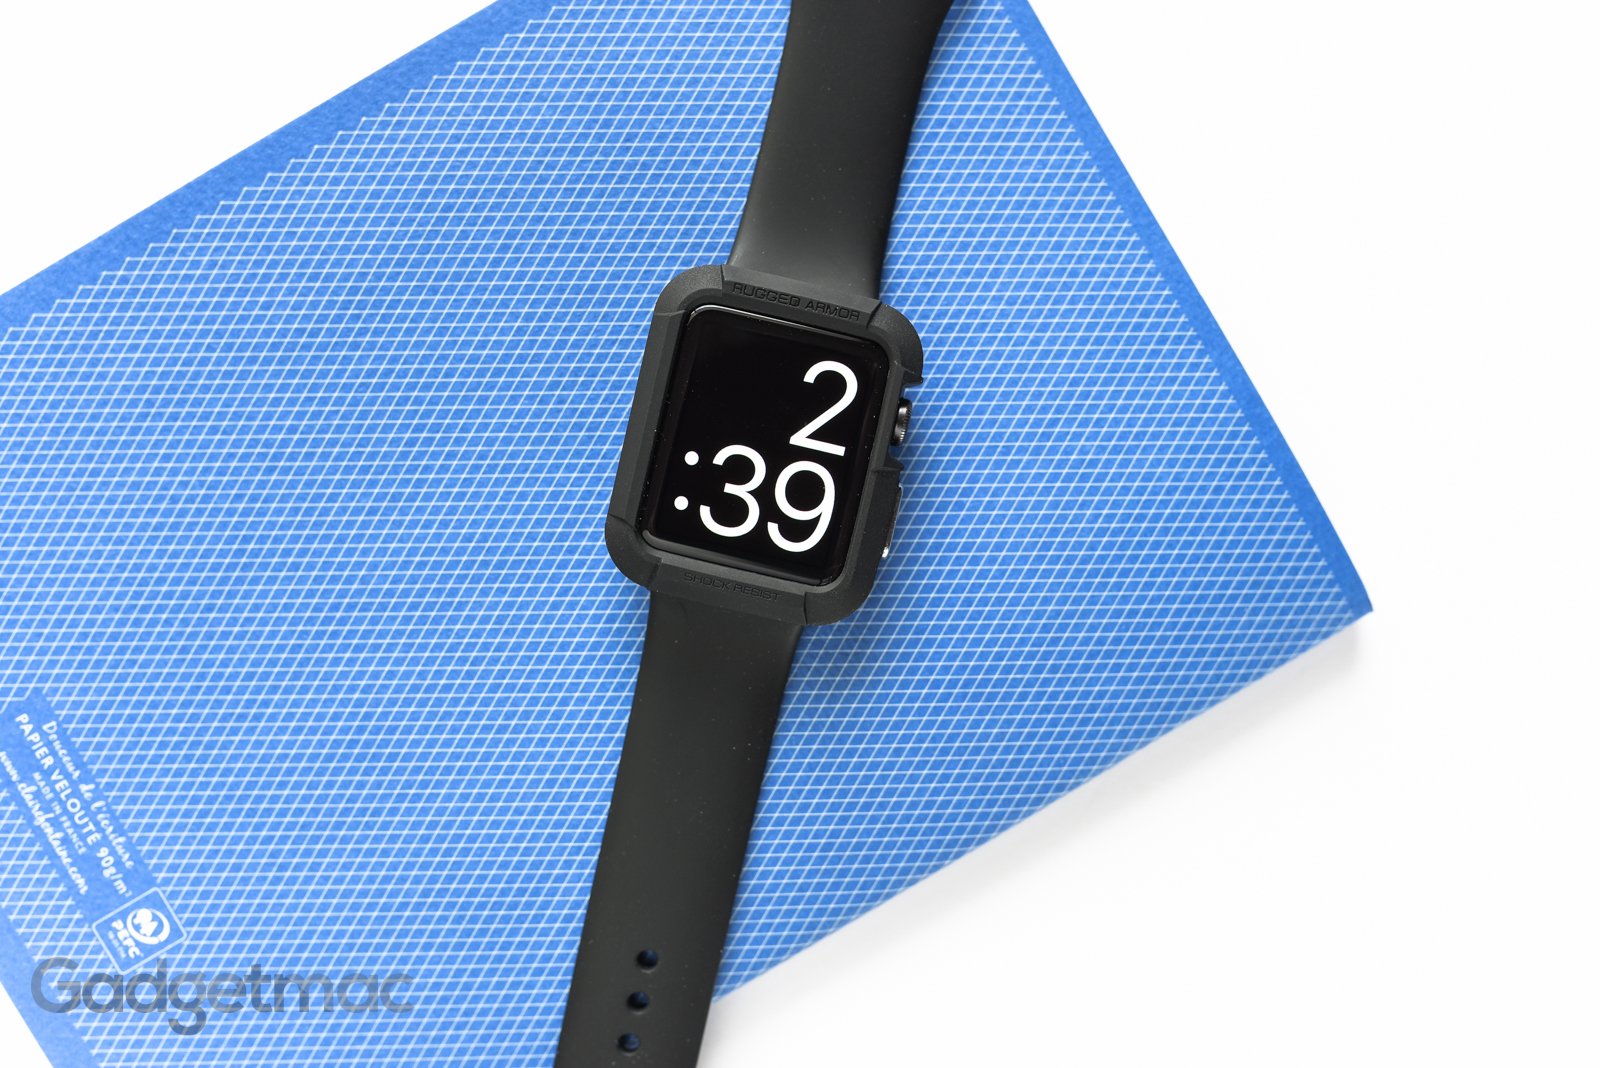 spigen-rugged-armor-case-for-apple-watch-space-gray-black-top.jpg